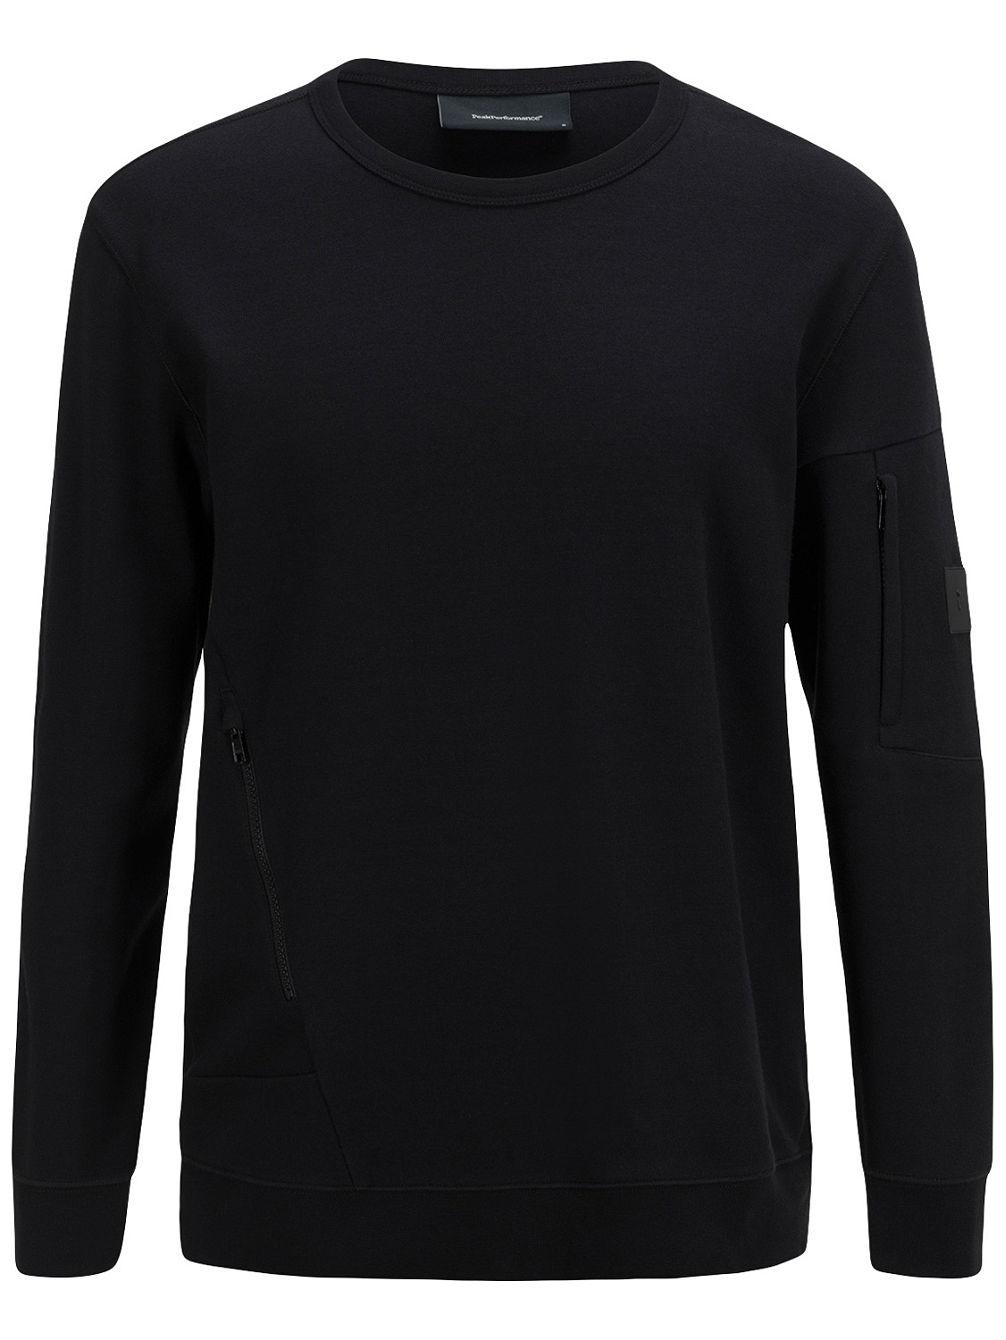 Peak Performance Scrill Crew Sweater